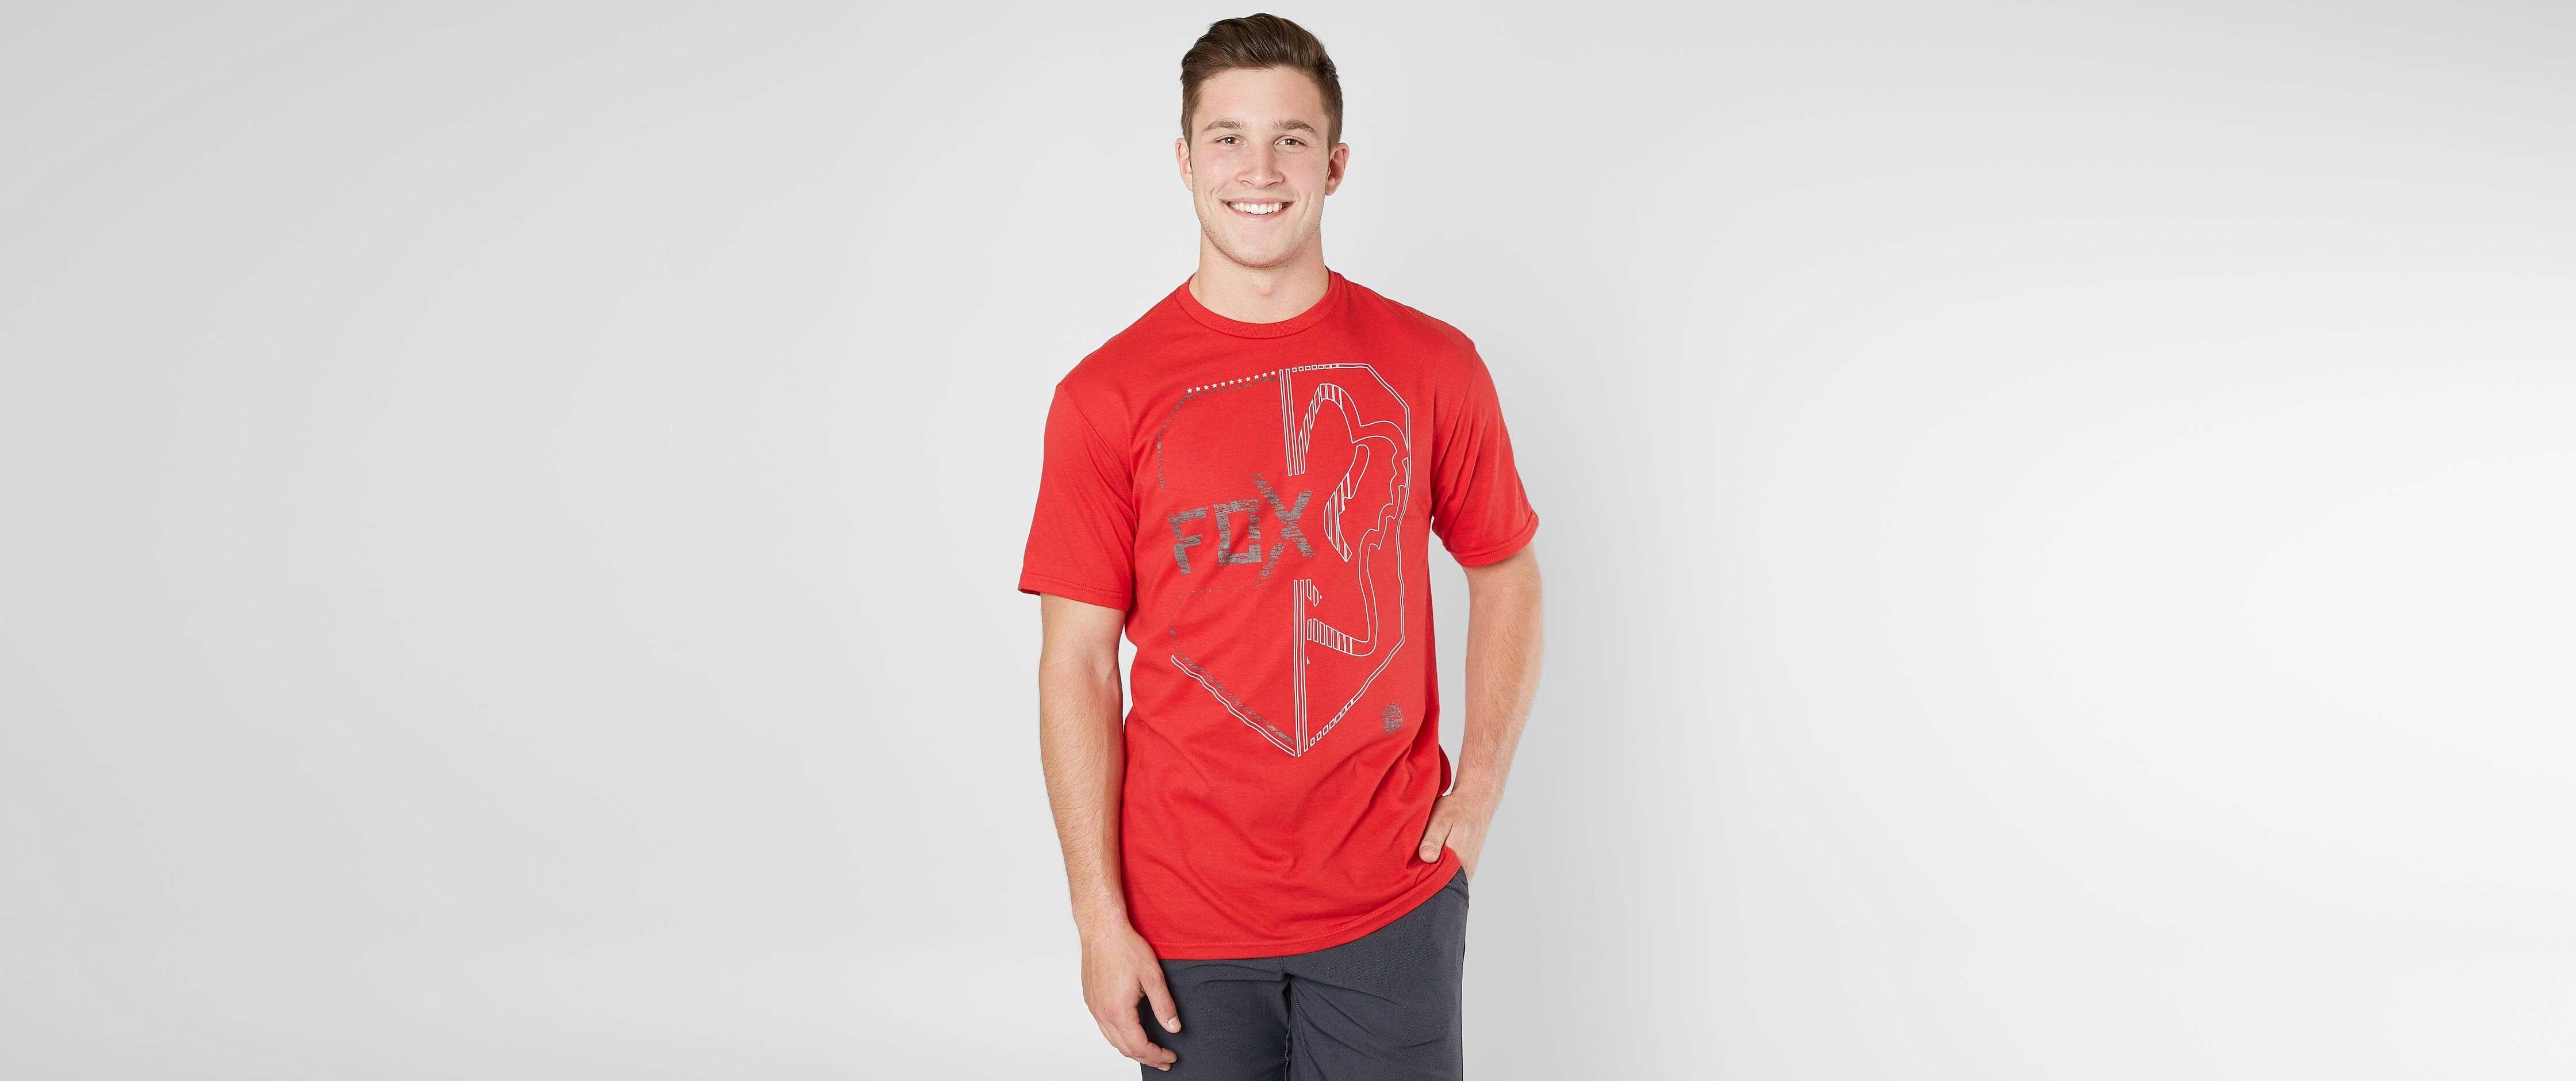 Cheap Fox Next Time T-Shirt for cheap